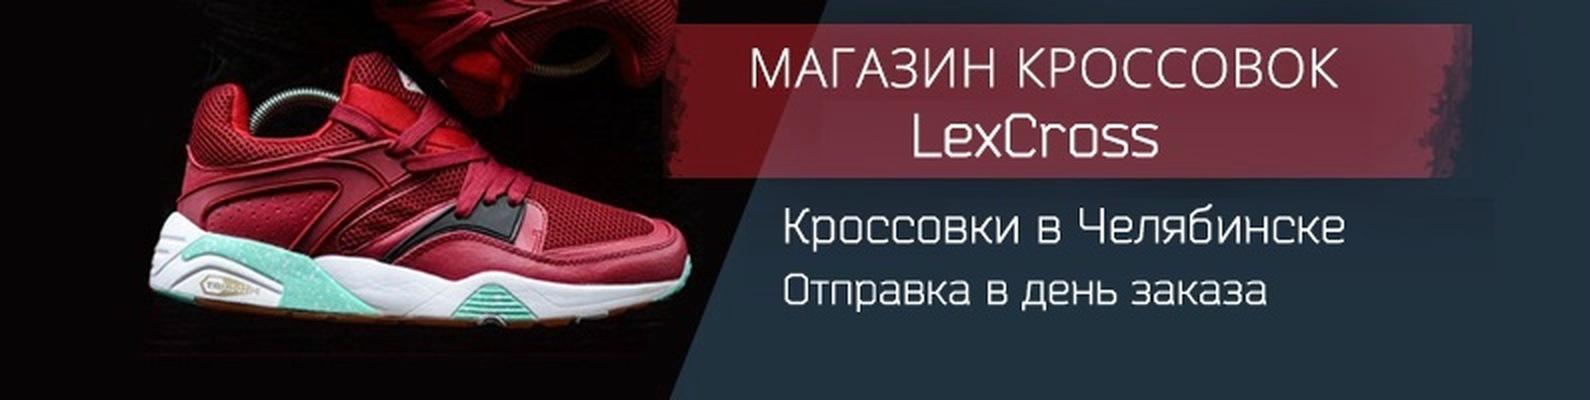 cbfa5ecbe347 Магазин LexCross - Кроссовки в Челябинске   ВКонтакте